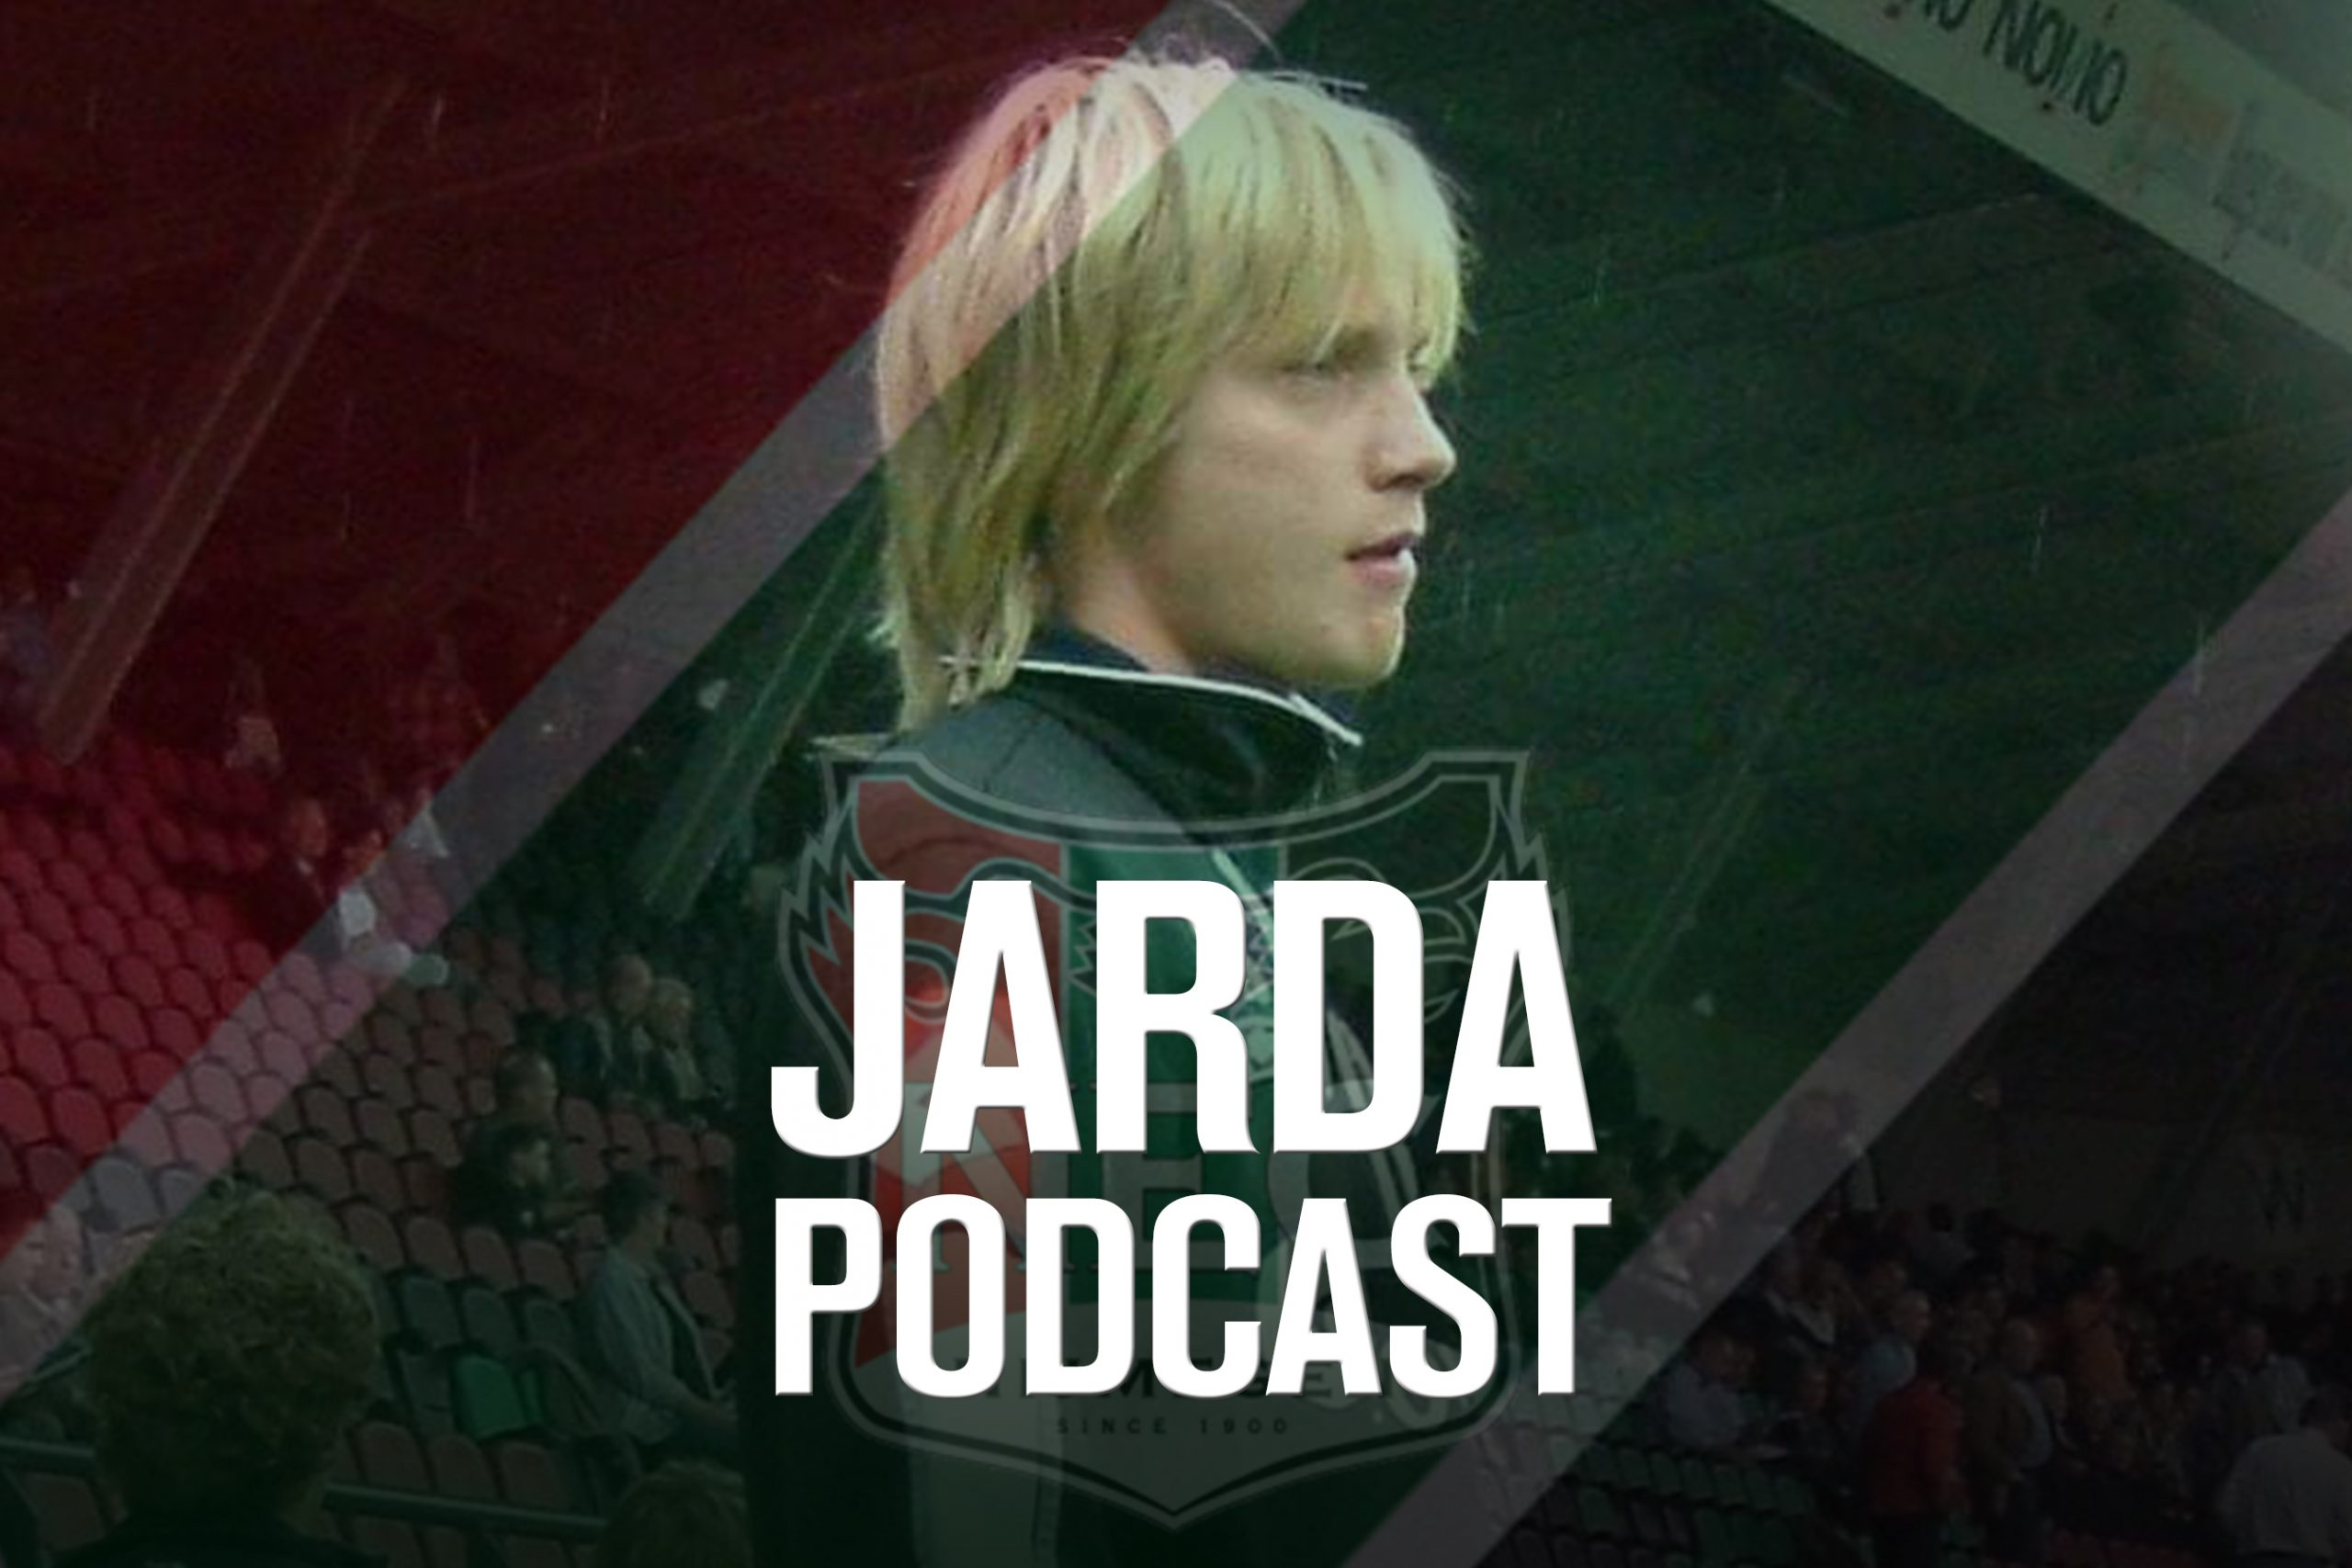 Jarda Podcast #7: Slechte aflevering Flikken Maastricht en het lastige RKC